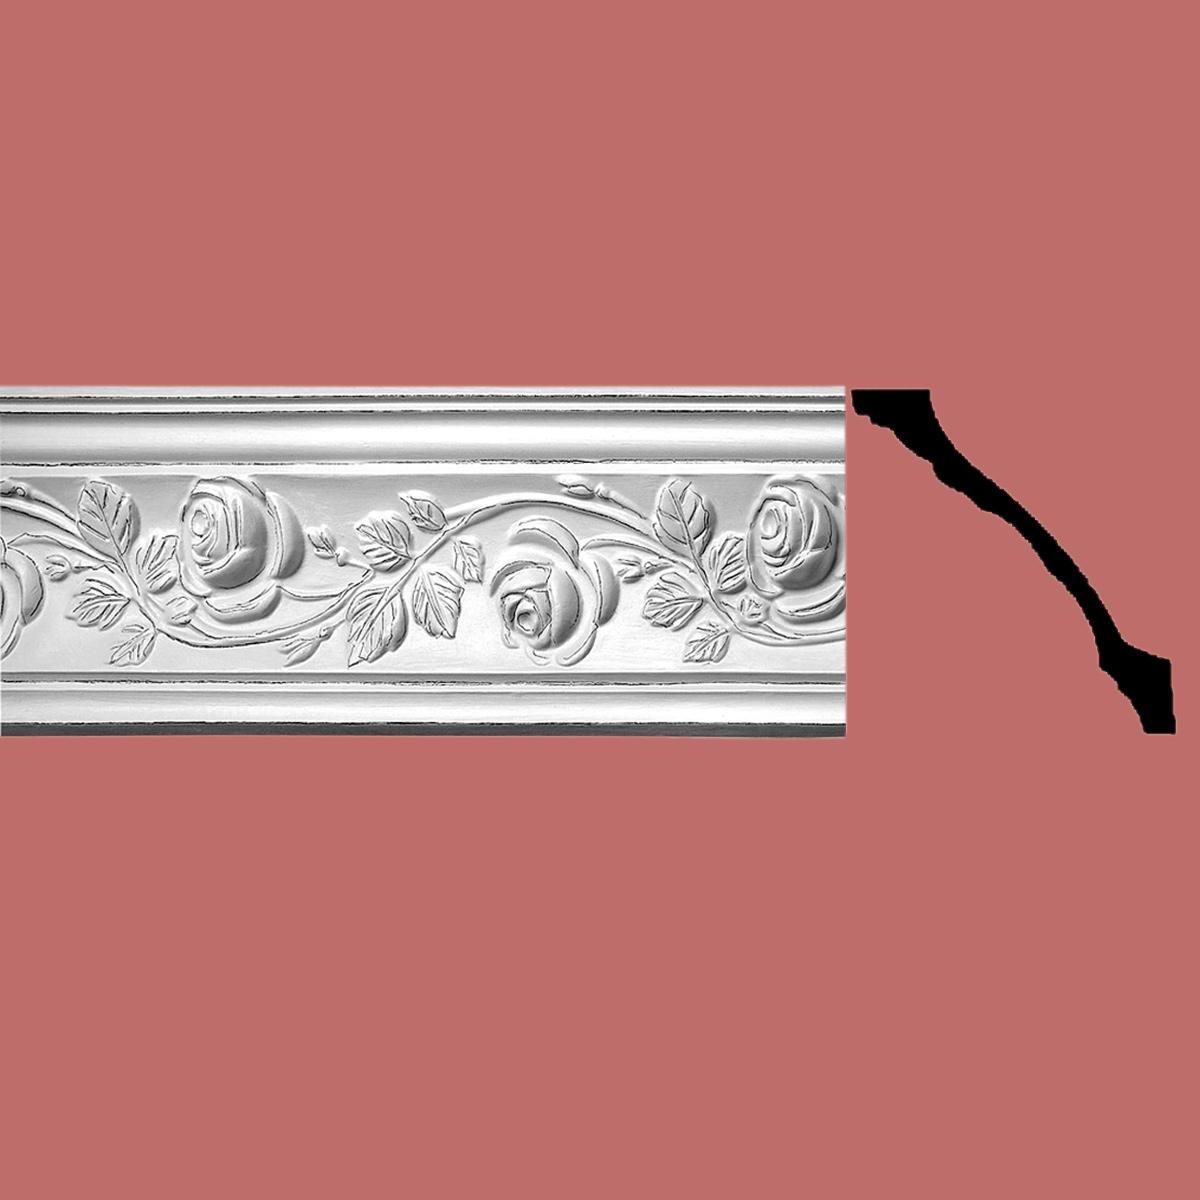 Cornice White Urethane Sample of 20420 Cornice Cornice Moulding Cornice Molding